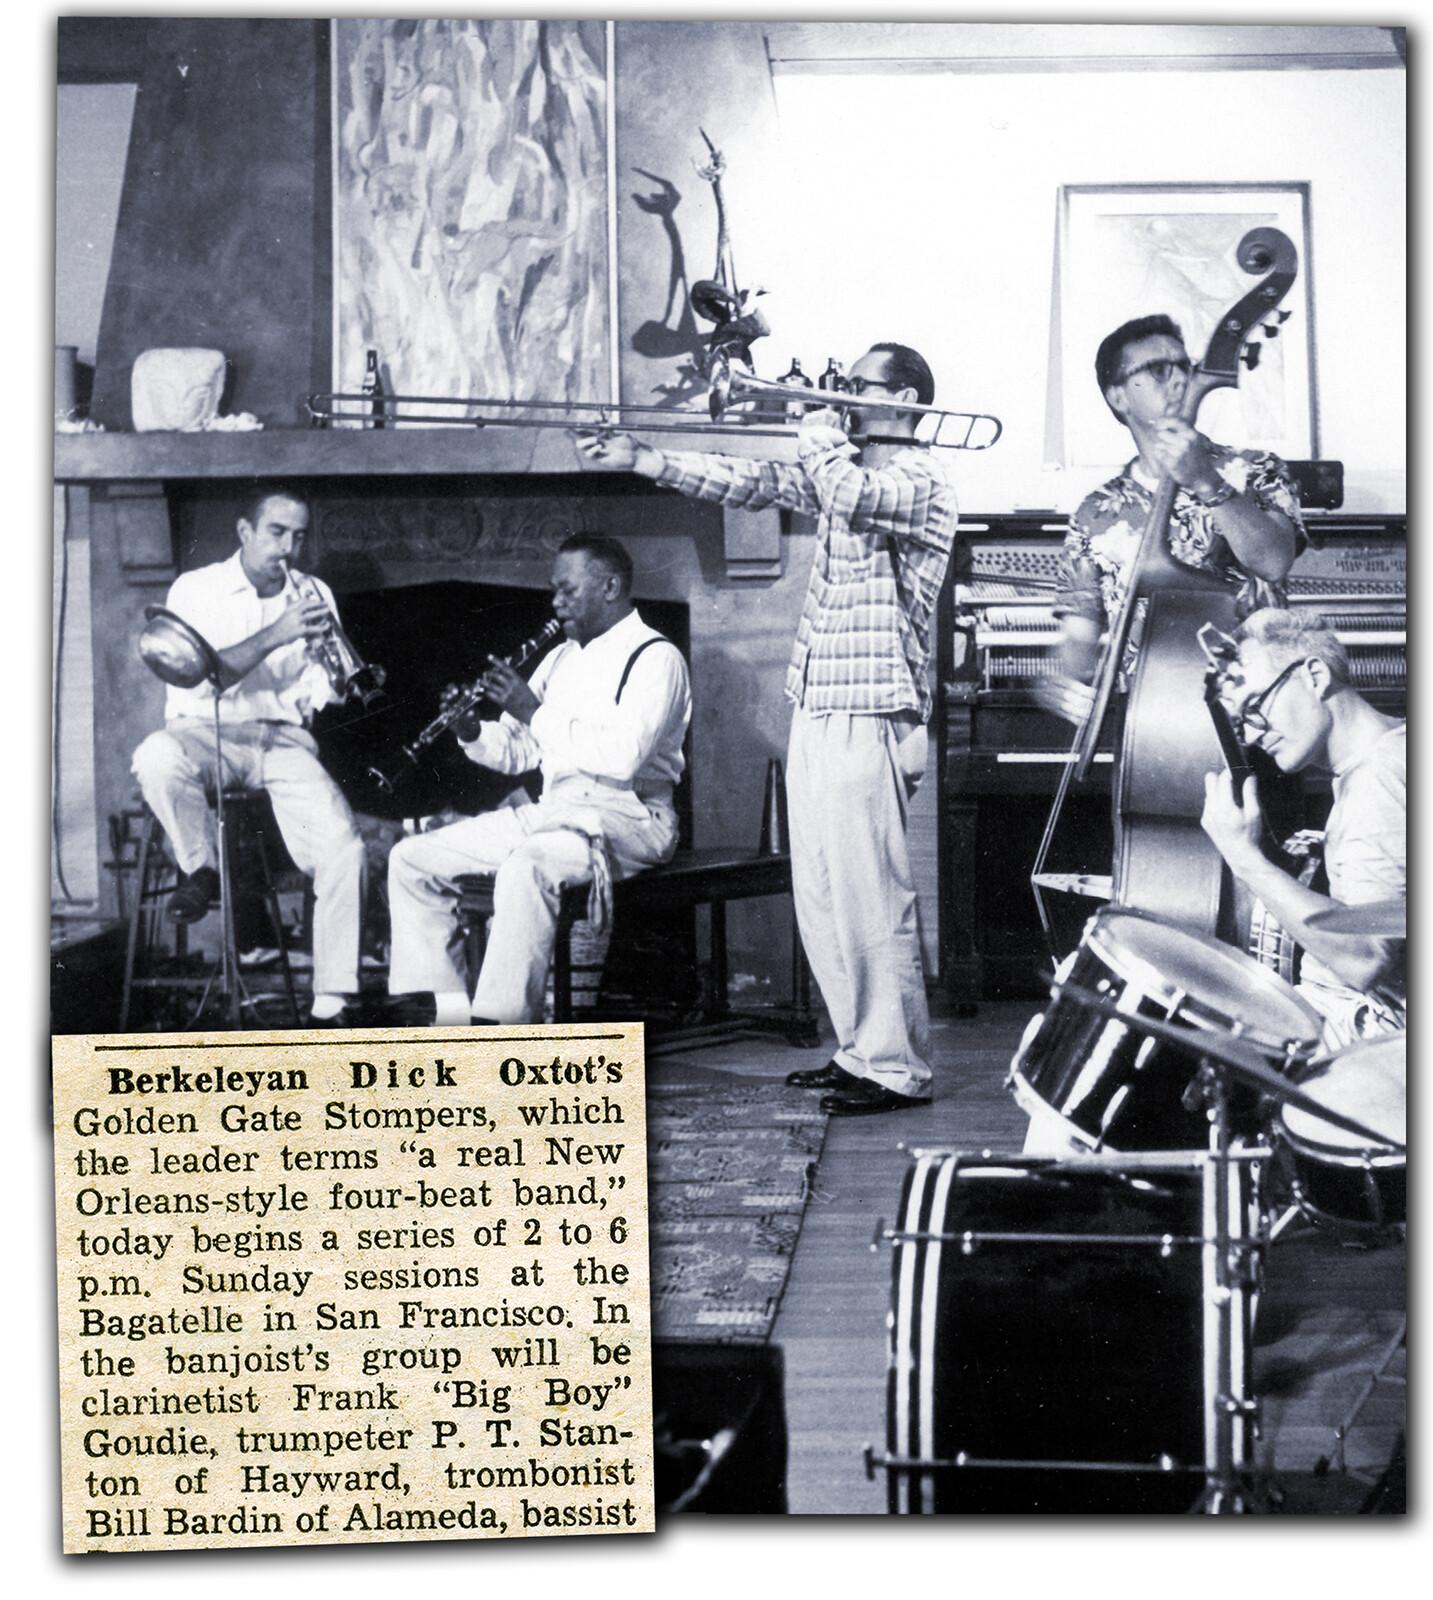 Dick Oxtot's ensemble from the Bagatelle